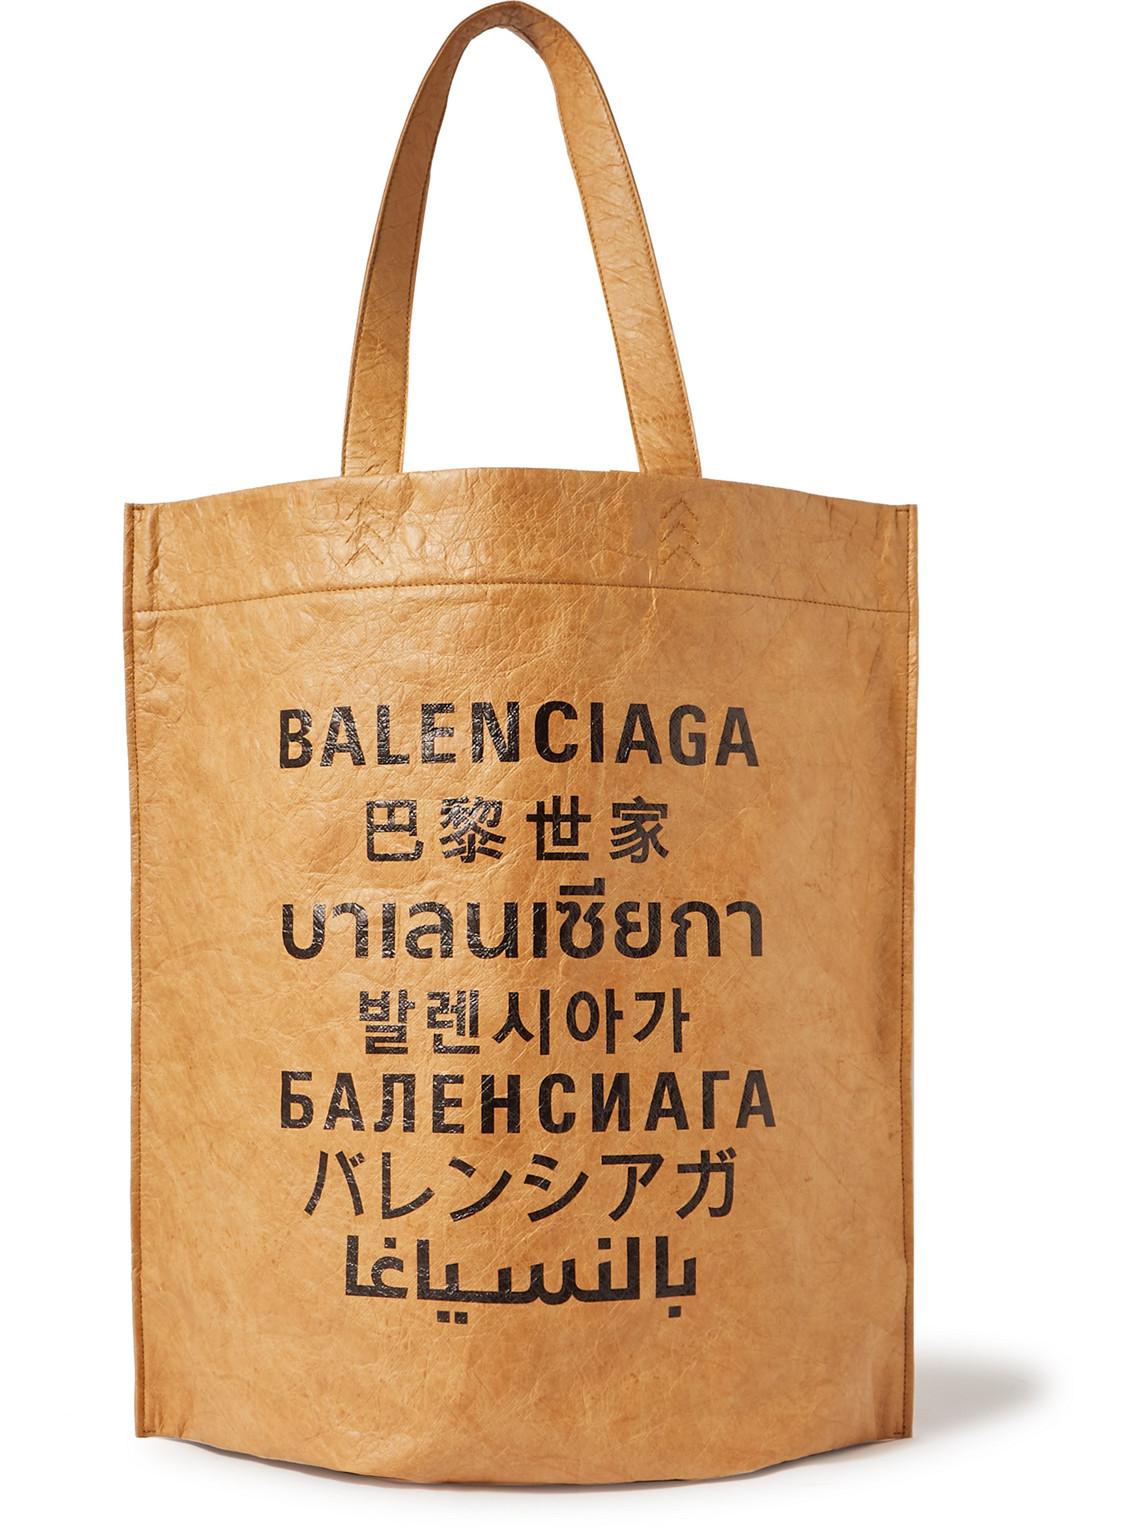 BALENCIAGA LOGO-PRINT COATED-PAPER TOTE BAG